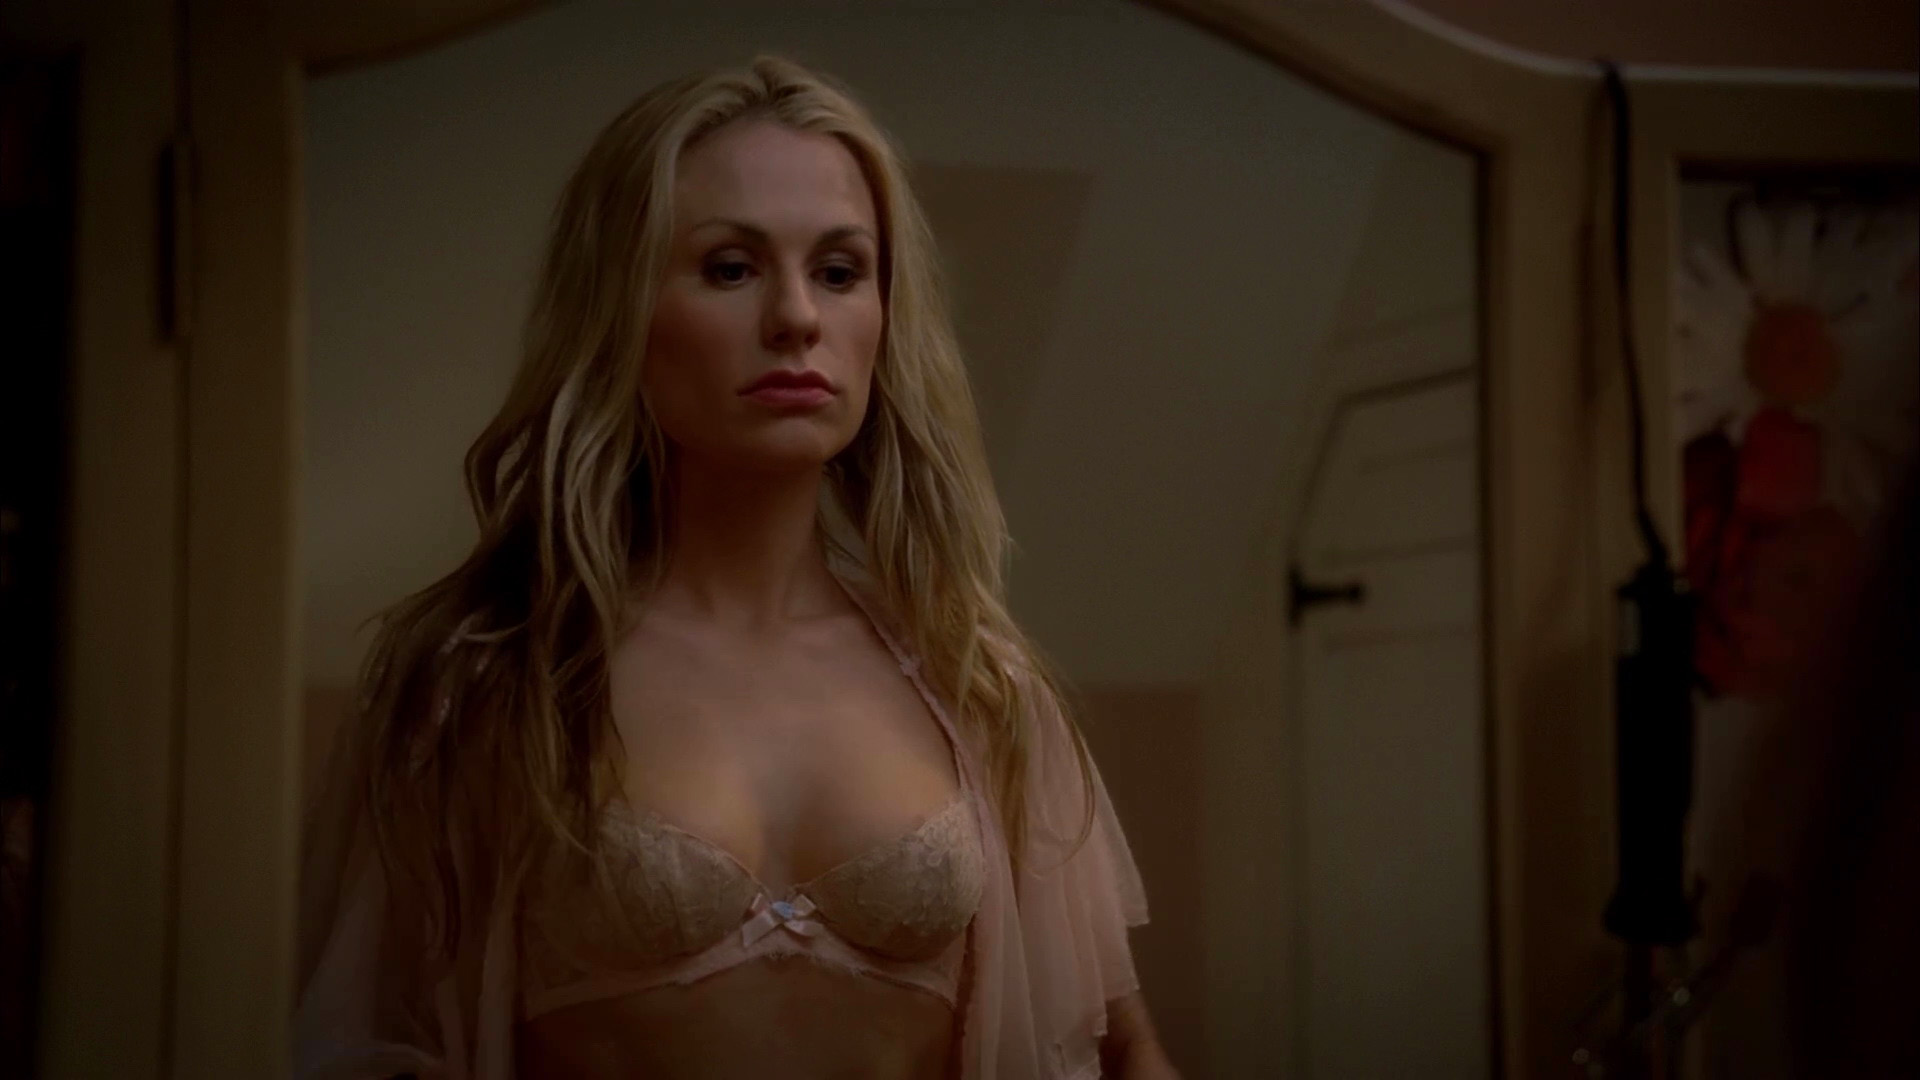 Anna Paquin Porno watch online - anna paquin – true blood s06e04 (2013) hd 1080p